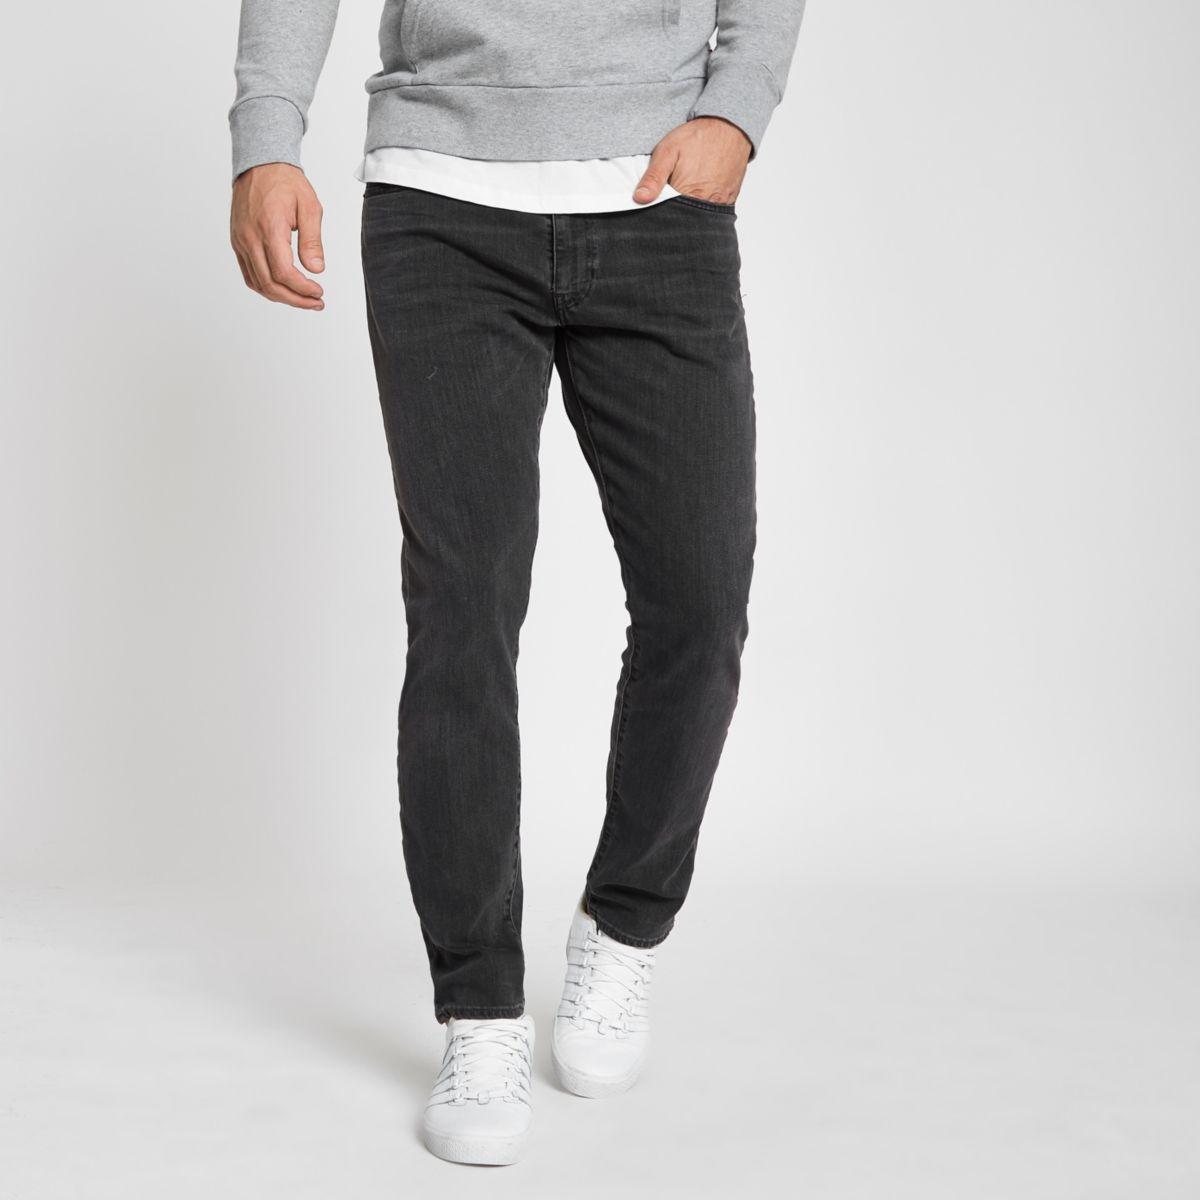 Levis 512 dark grey slim taper fit jeans